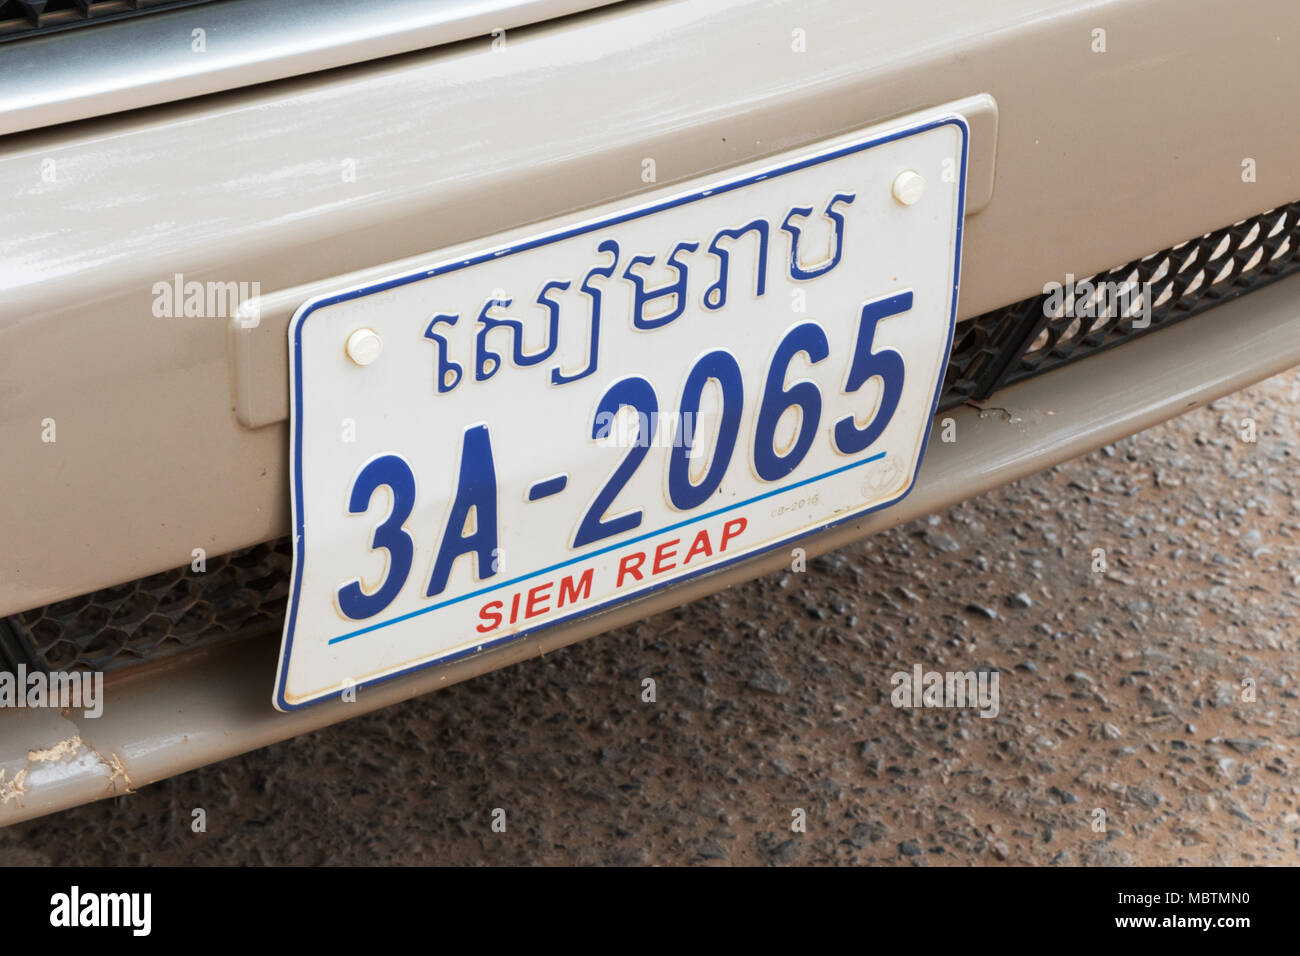 Vehicle Registration Stockfotos & Vehicle Registration Bilder ...